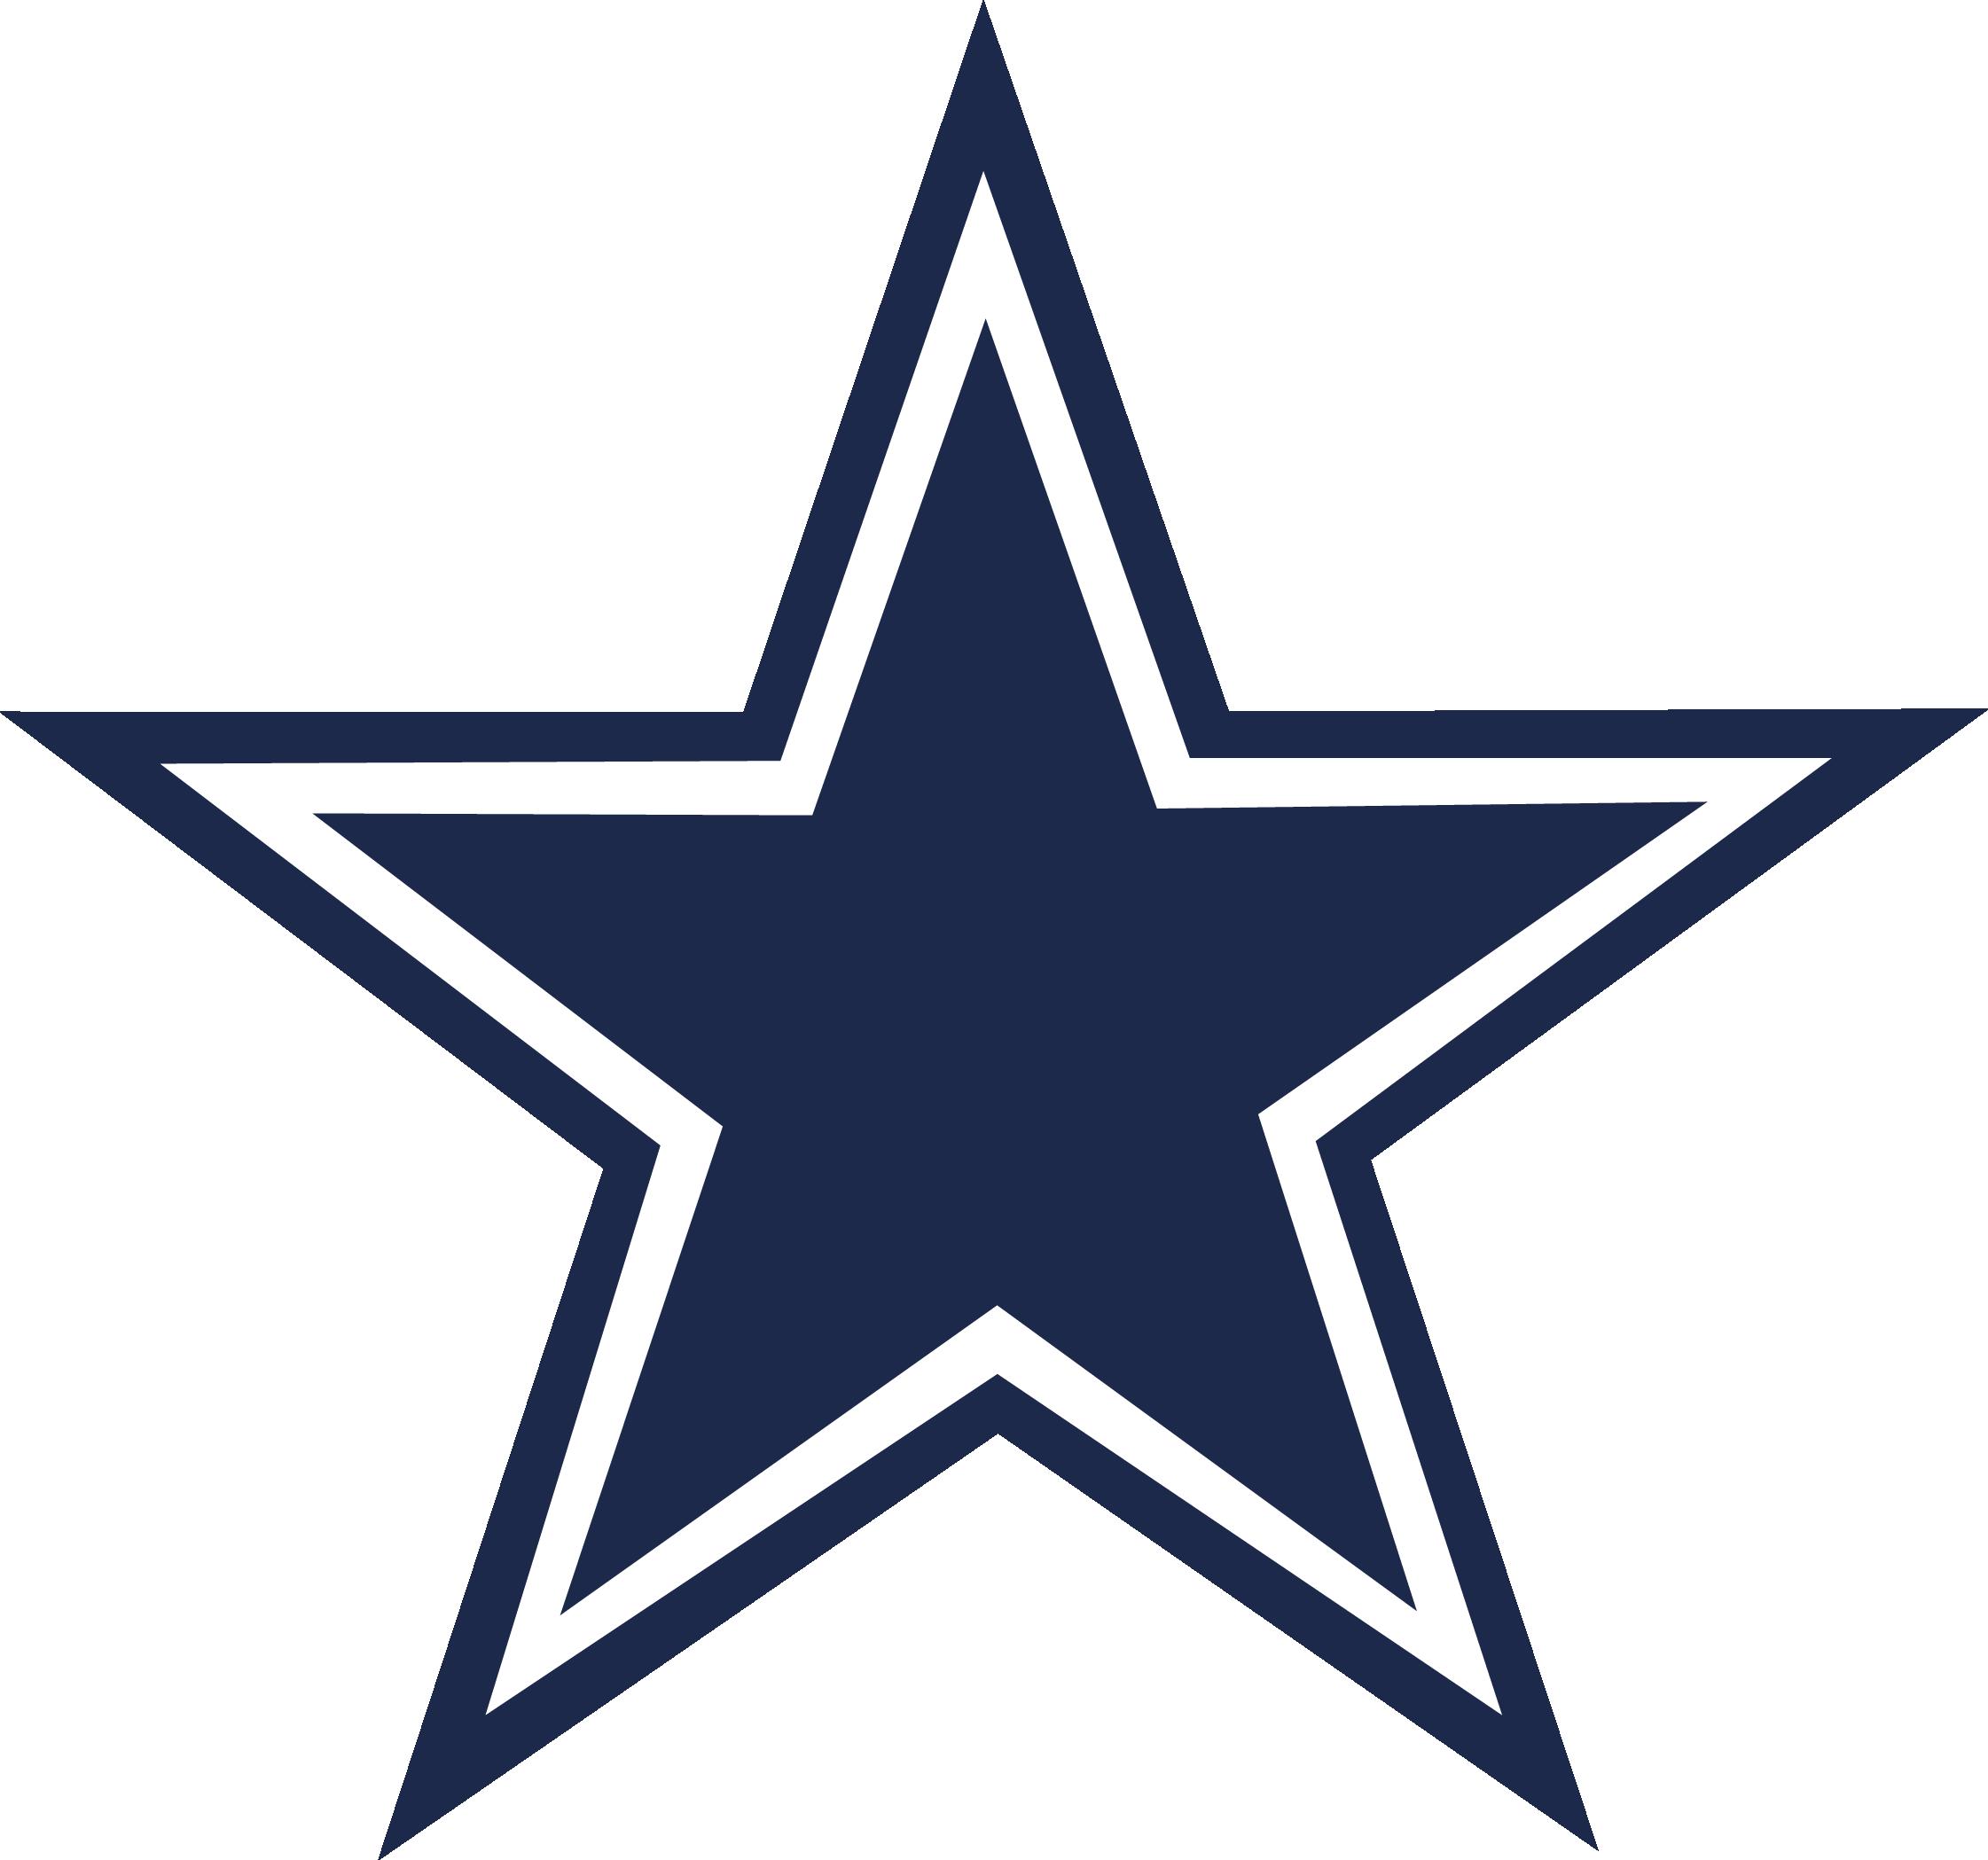 Dallas cowboys emblem clipart clipart transparent library Dallas Cowboys Logo Vector EPS Free Download, Logo, Icons ... clipart transparent library